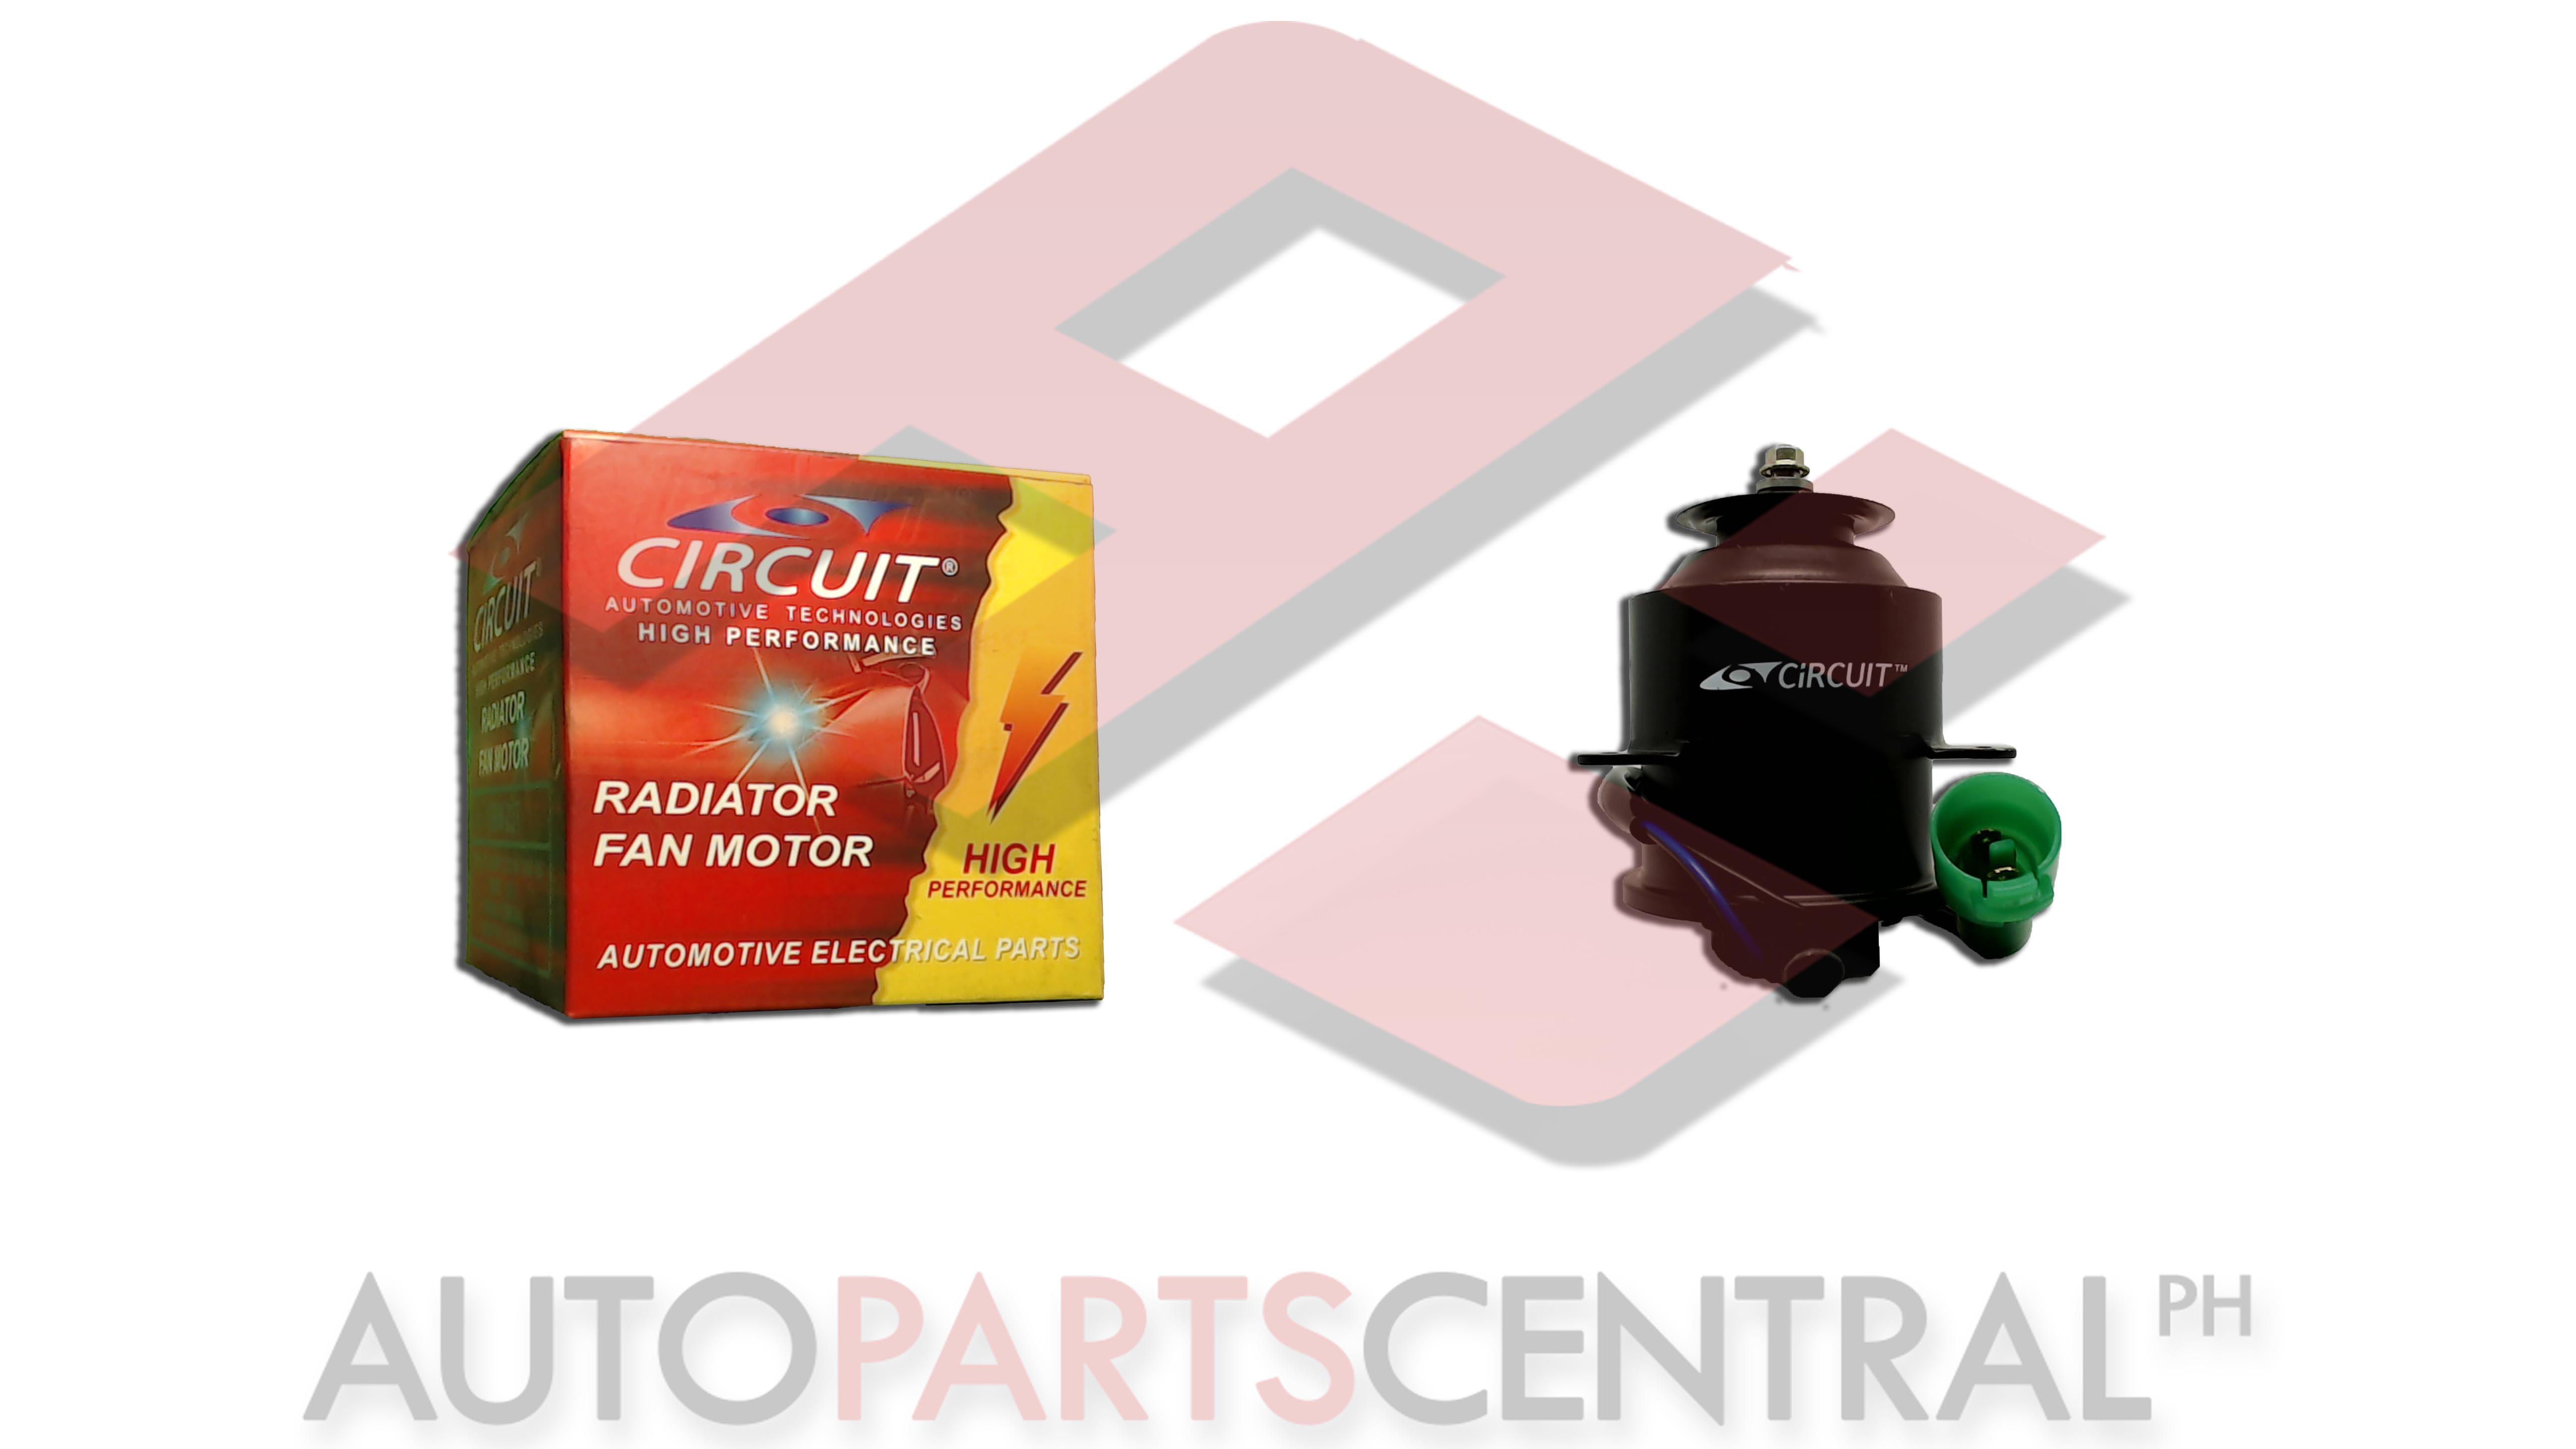 Radiator Fan Motor Circuit Toyota Corona Autopartscentralph Diagram